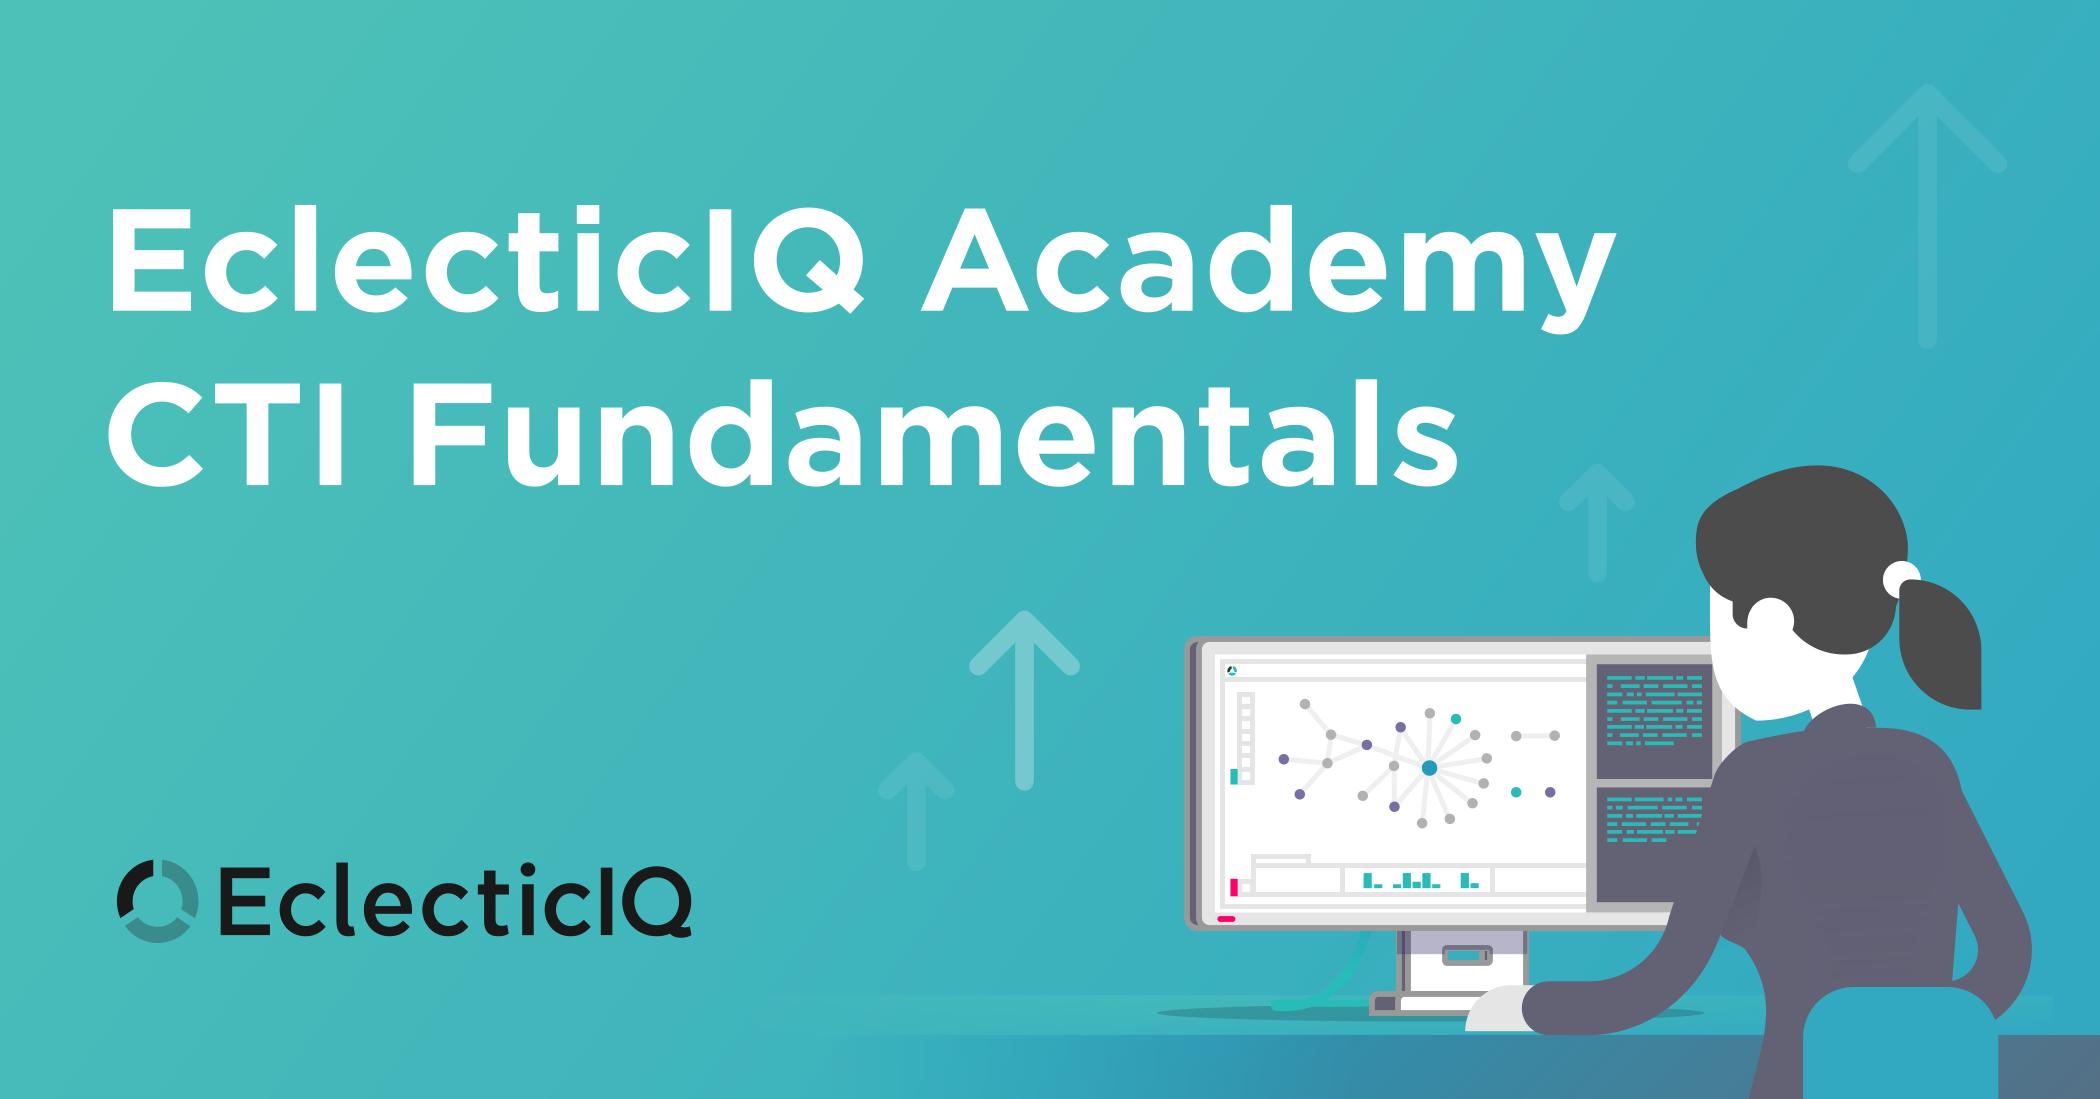 EclecticIQ Academy CTI Fundamentals